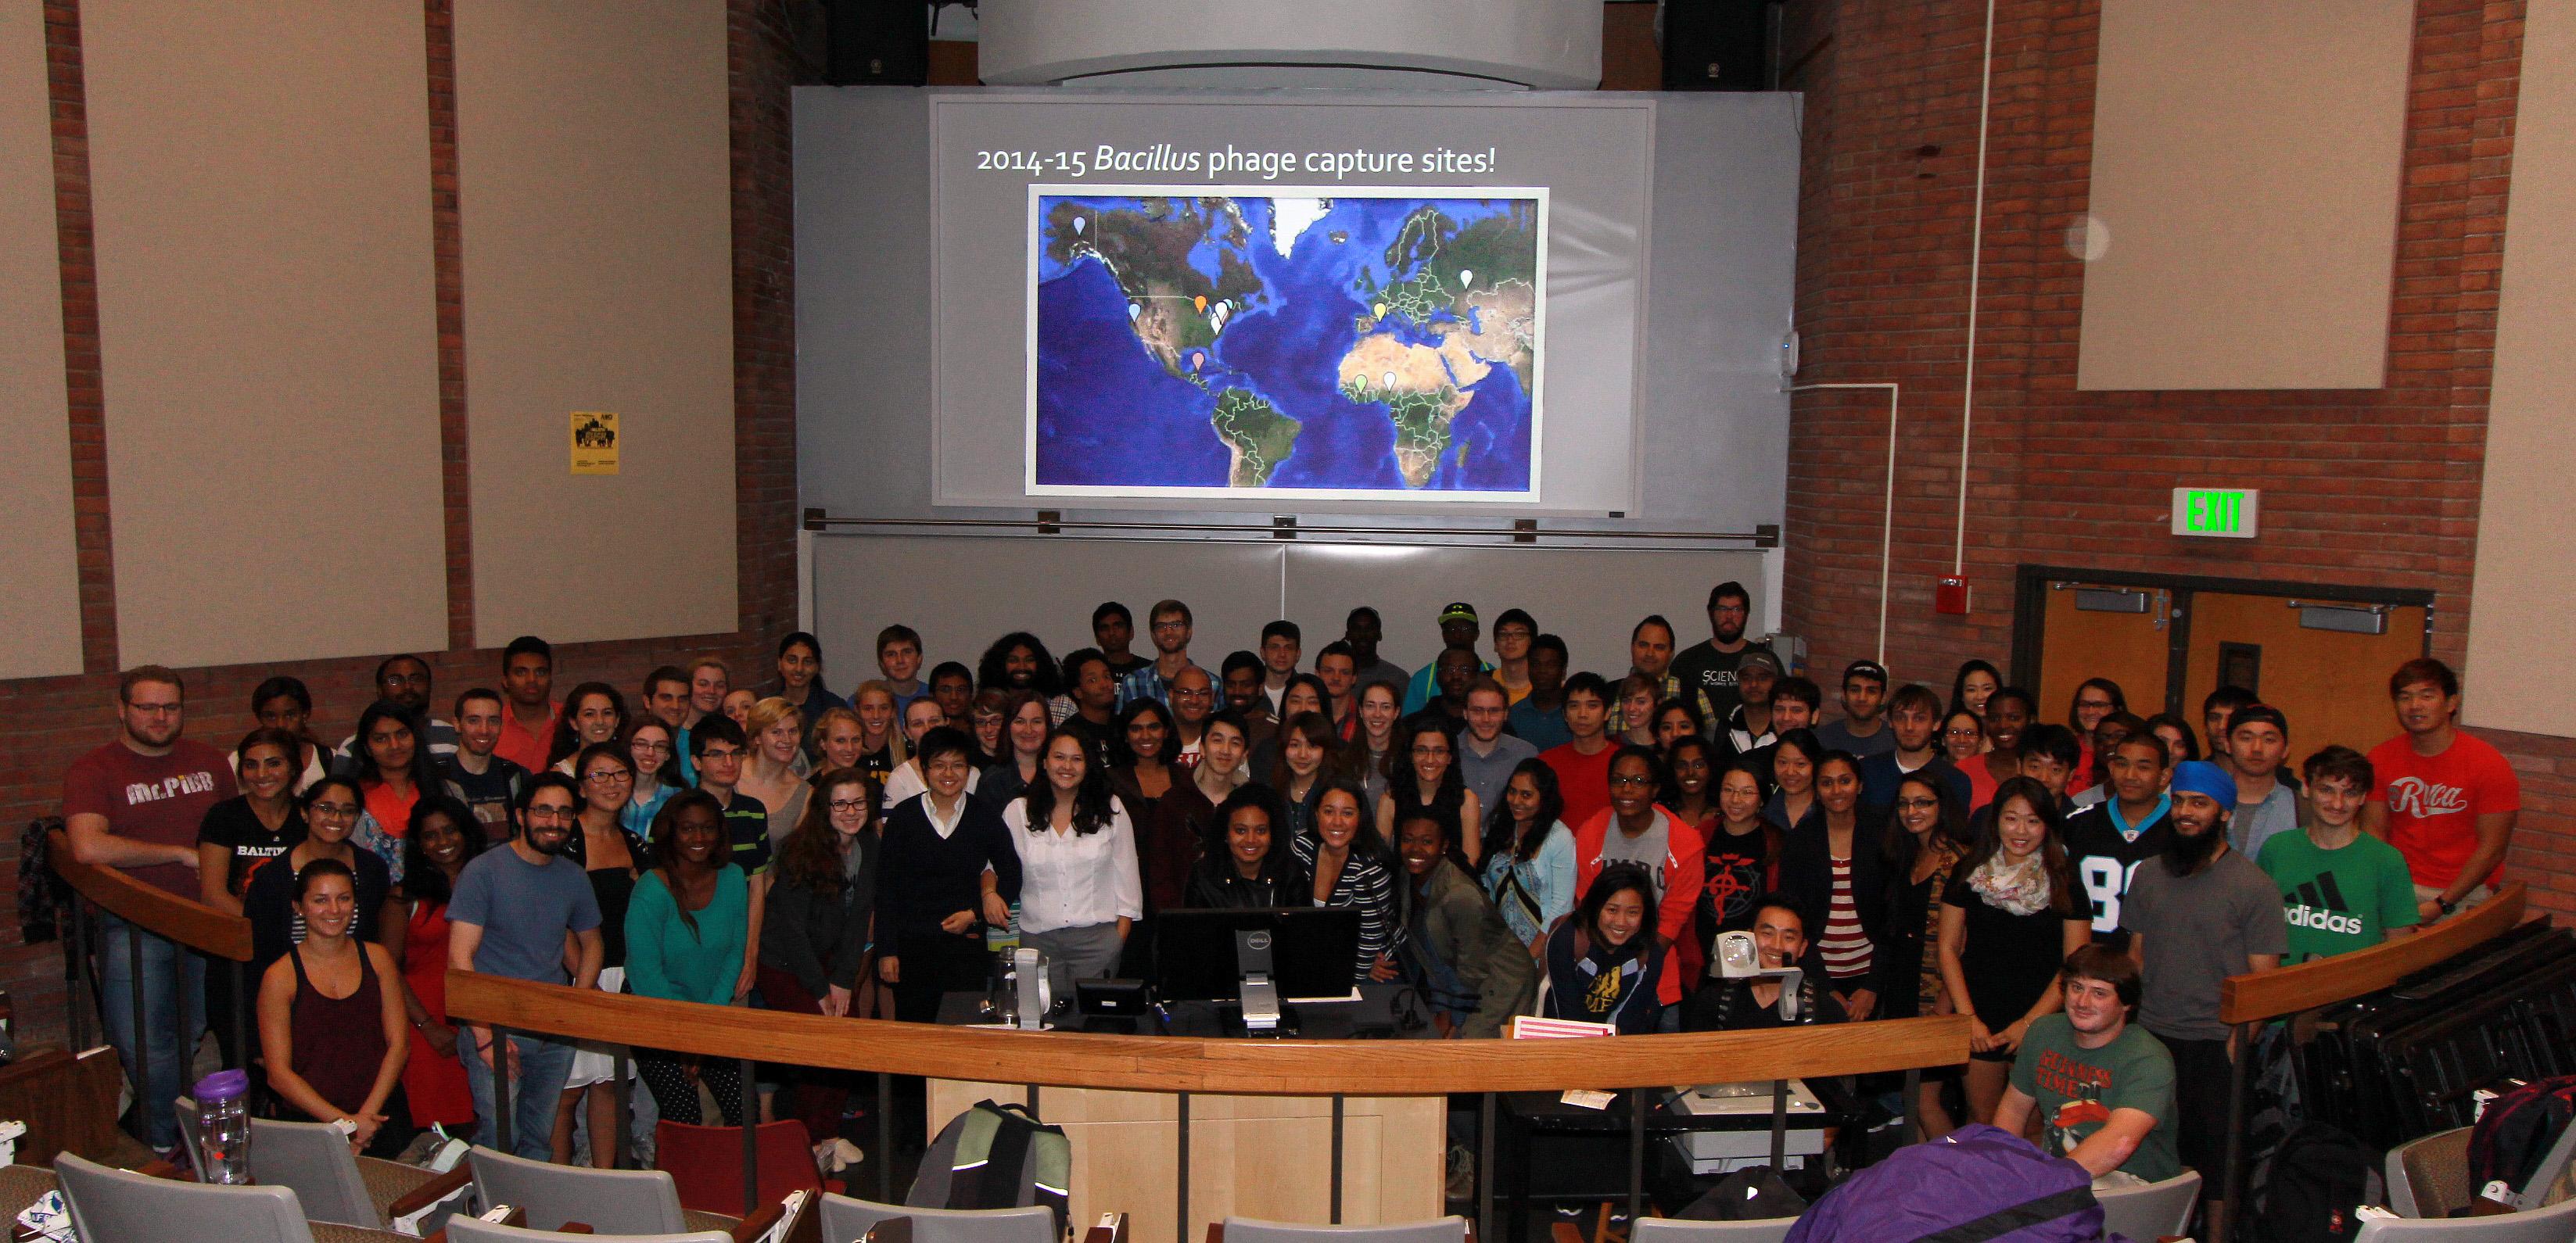 UMBC Fall 2014 Class